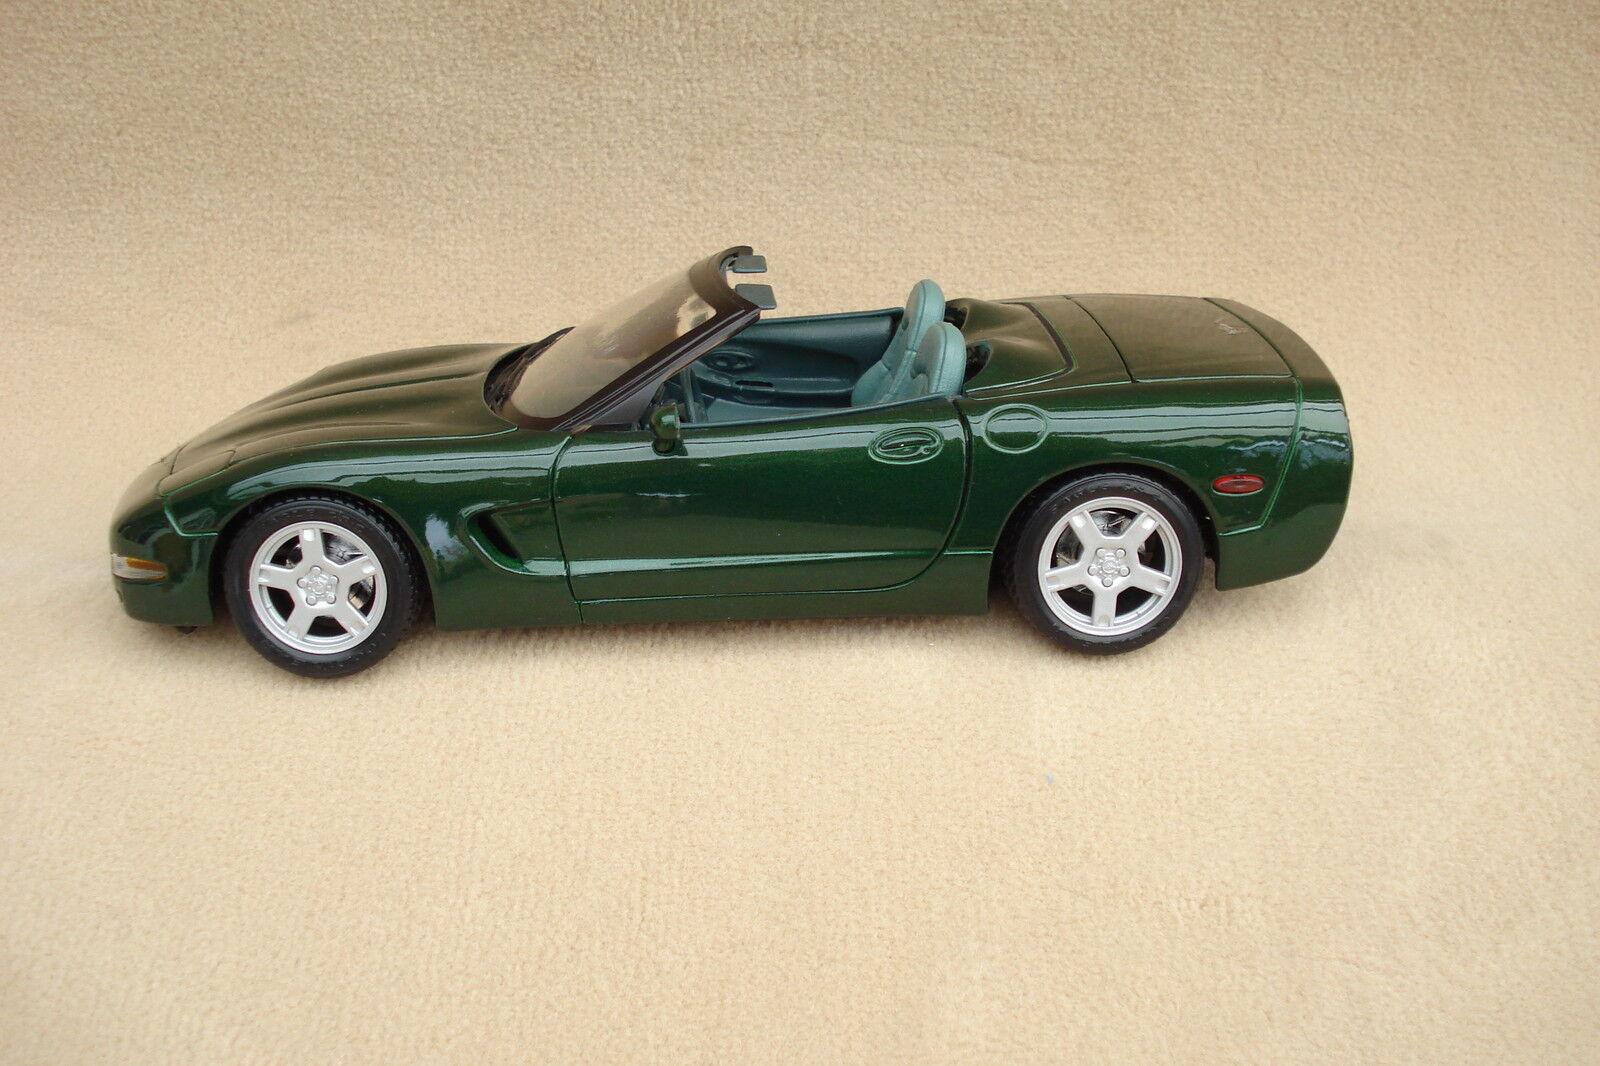 Corvette Modell 1 18  (neu) - Maisto - Cabrio C5 1998 fairway green green